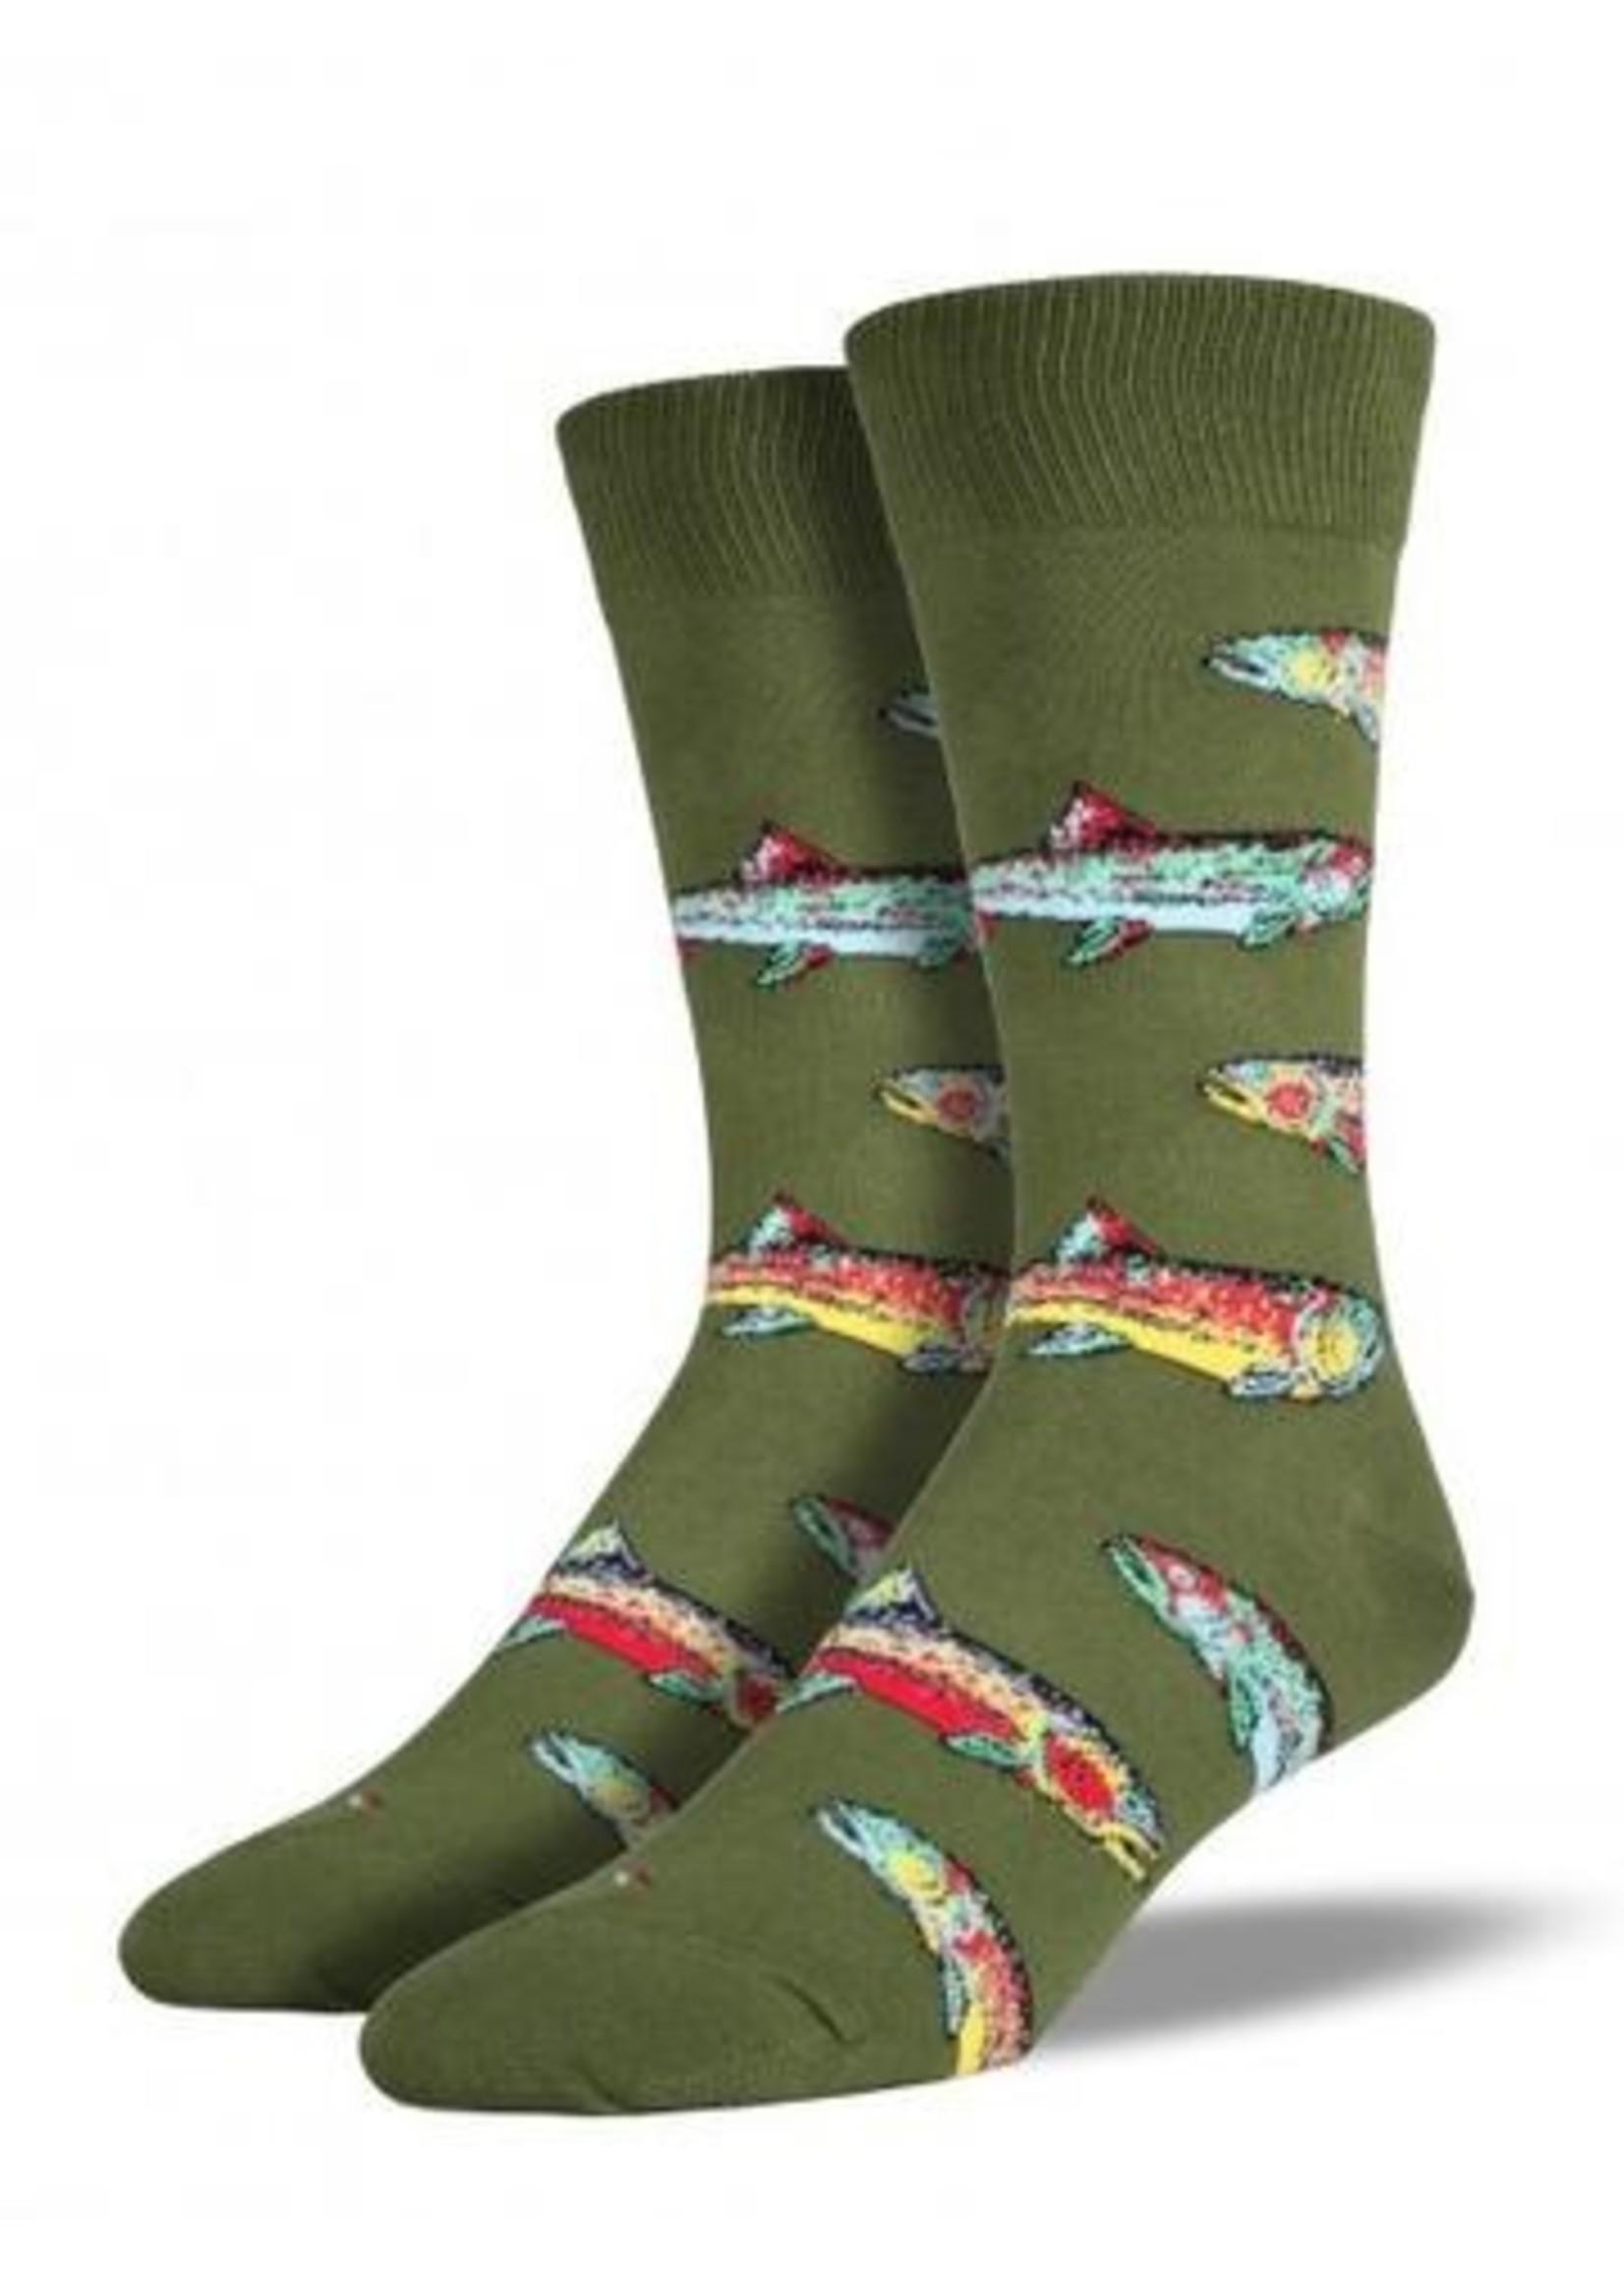 Socksmith Canada Inc MEN'S TROUT SOCKS